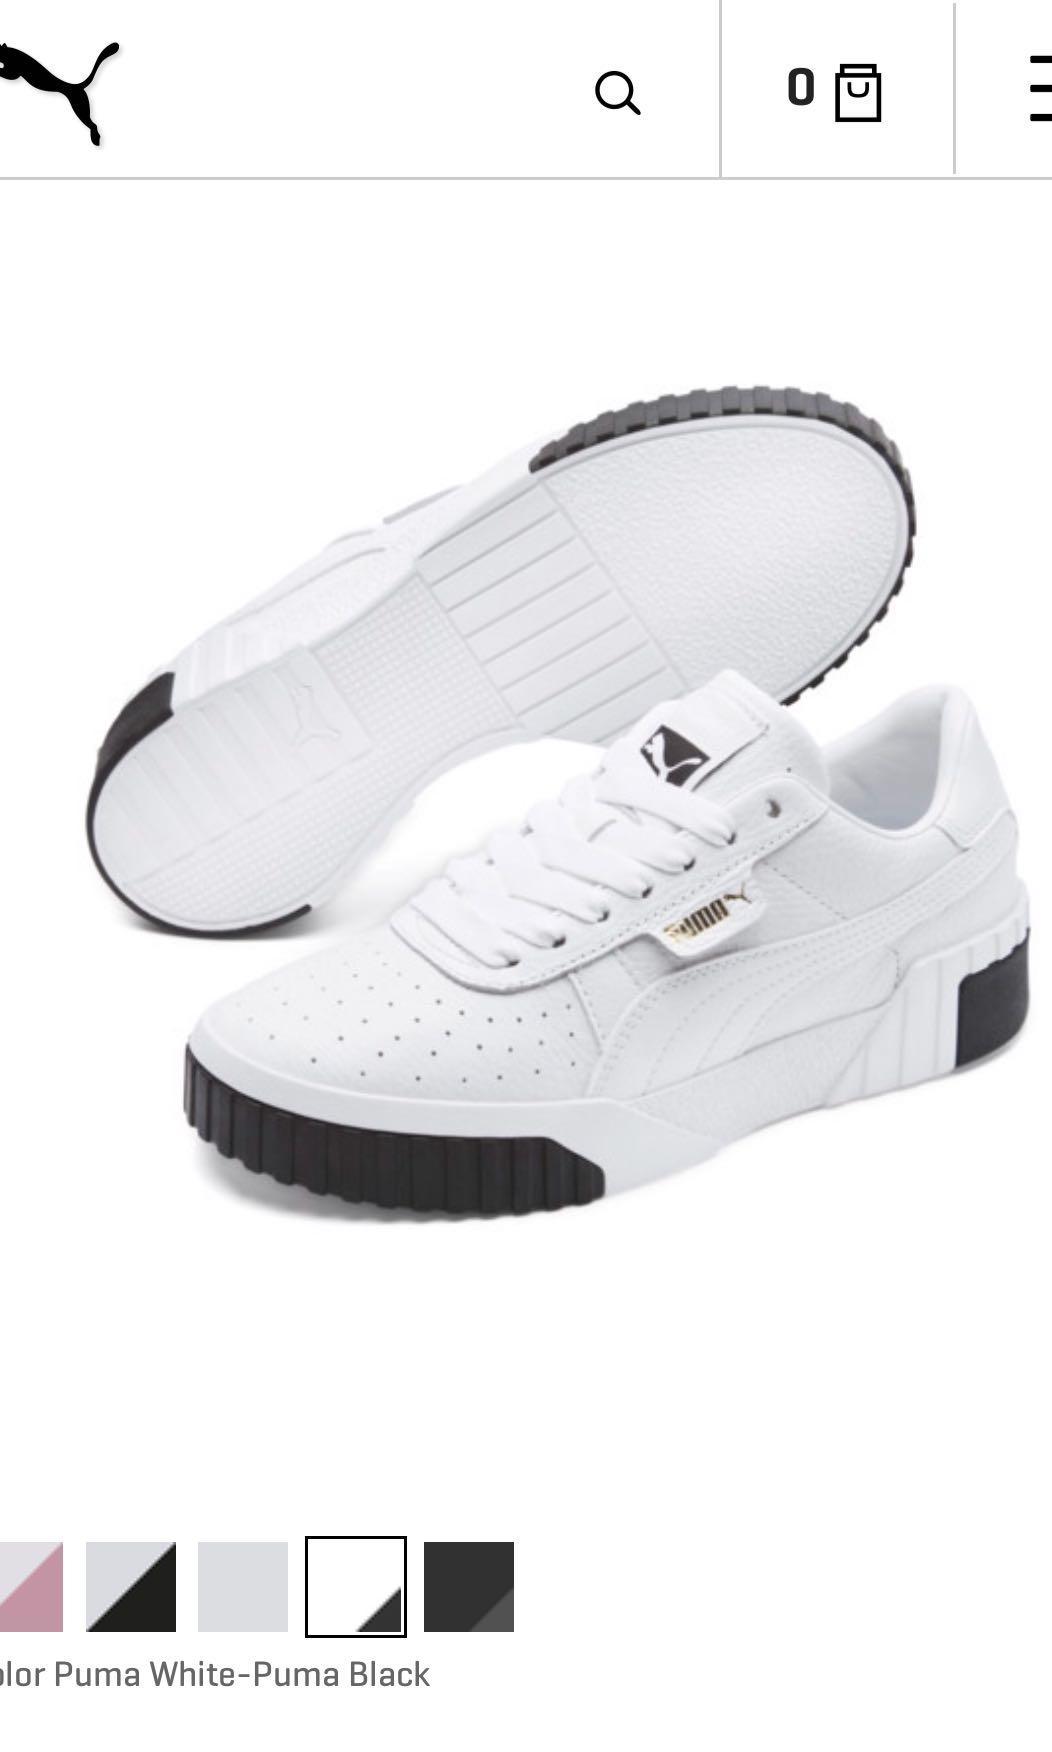 brand new puma Cali fashion sneakers